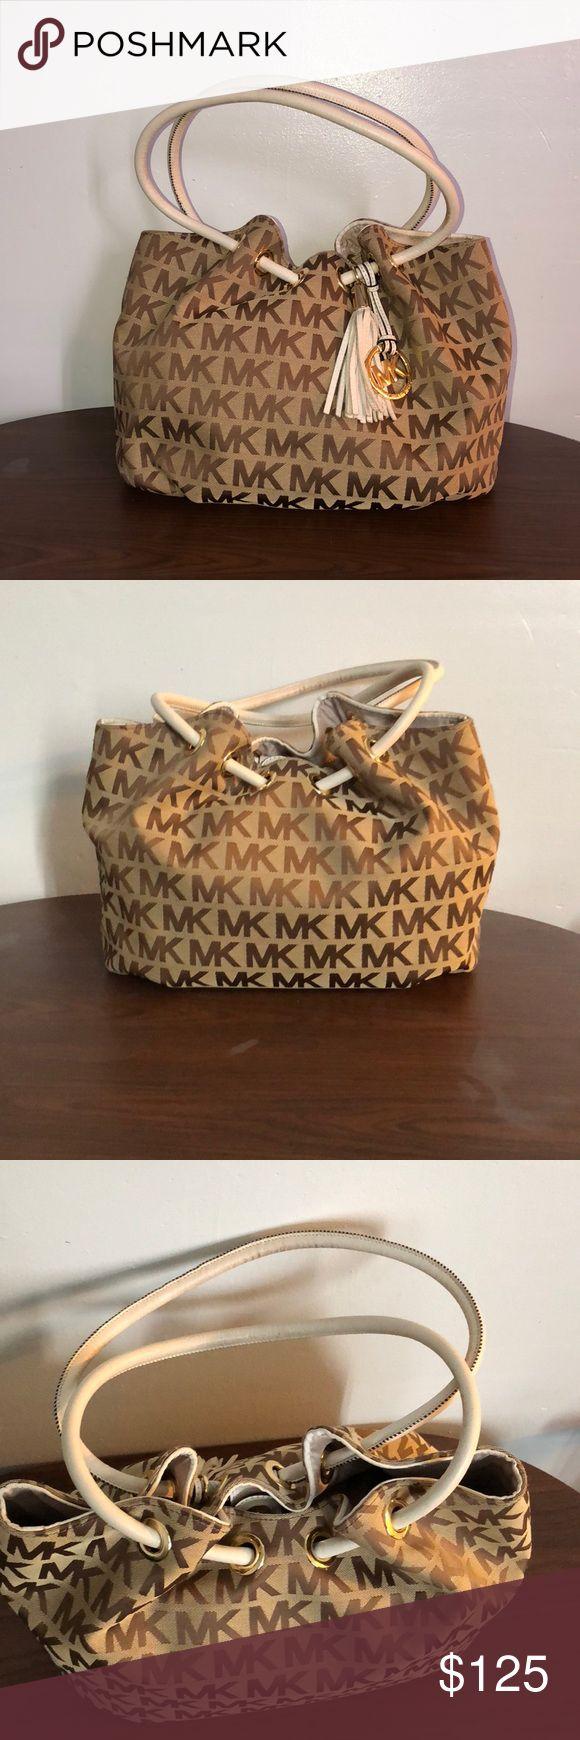 Michael kors purse Cute MK bag. I'm very good condition. 15 inches long. 10 inches tall. MICHAEL Michael Kors Bags Satchels